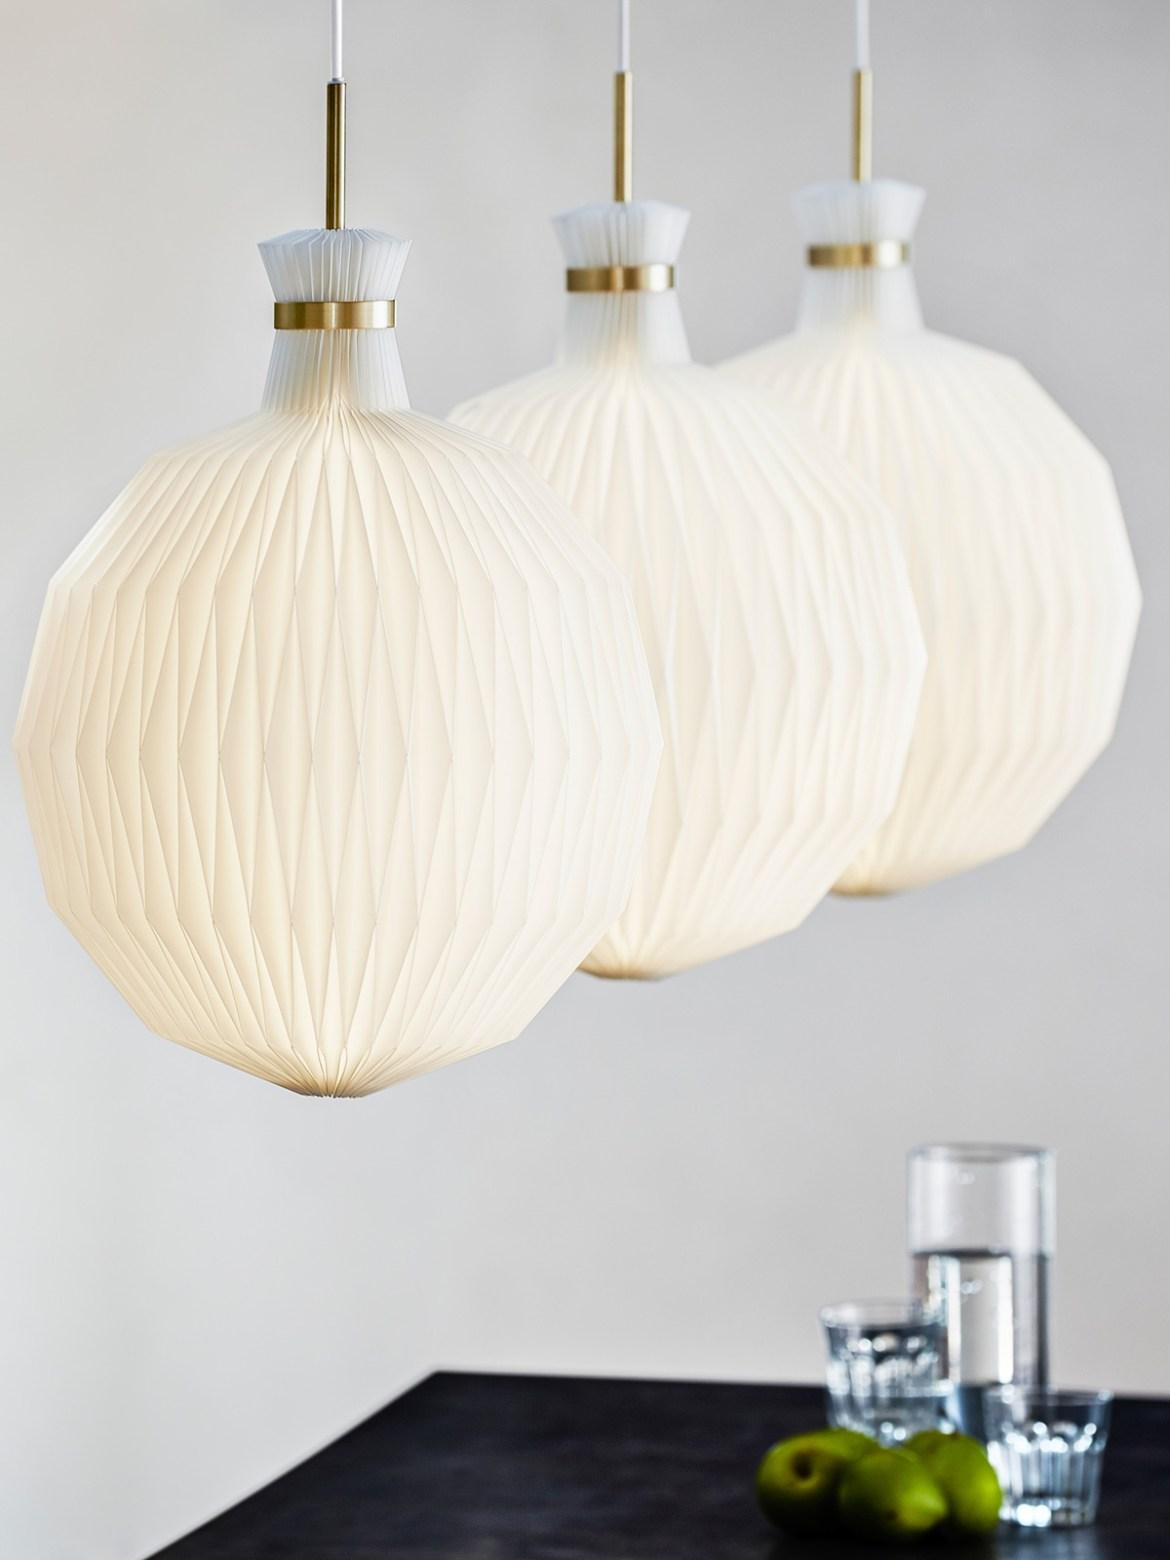 DesignOrt Lampen Blog: Retro Lampen Handgefaltete Lampe von Le Klint 101 XL